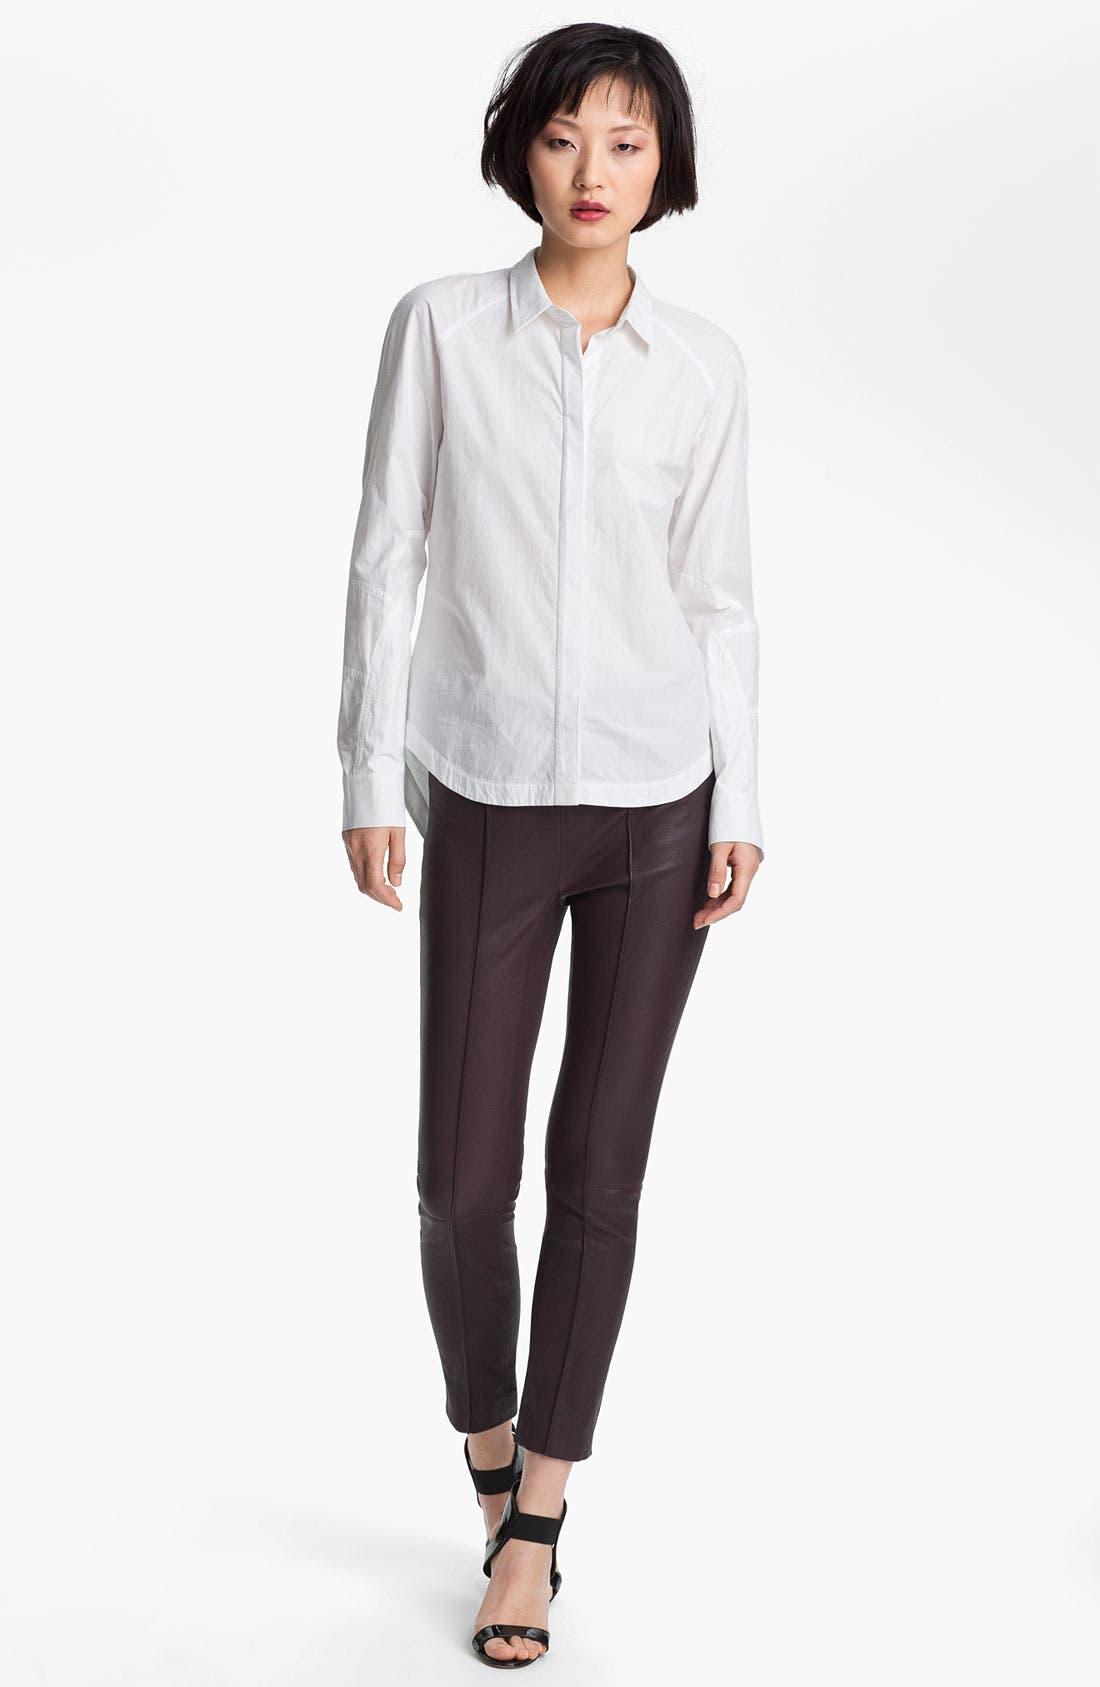 Alternate Image 1 Selected - 3.1 Phillip Lim Shirt & Leather Pants